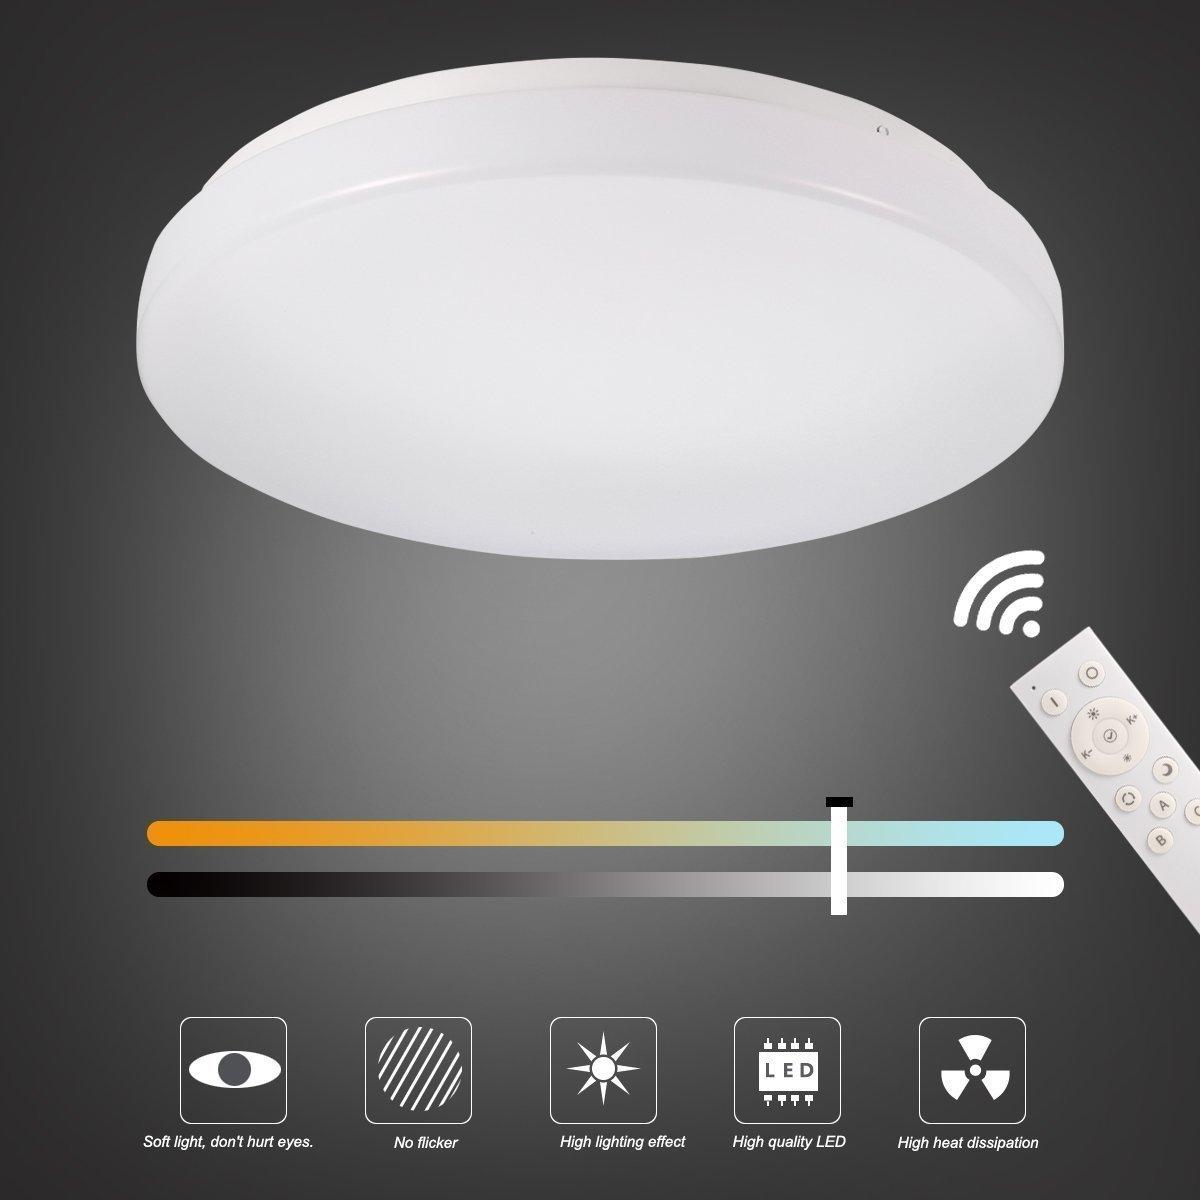 B-right Plafon led, 18W, con Luz Regulable & Cambiar la Temperatura de Color, con Control Remoto, AC85-265V, 1300LM, Alta Luminancia, Lámpara de Techo LED ...